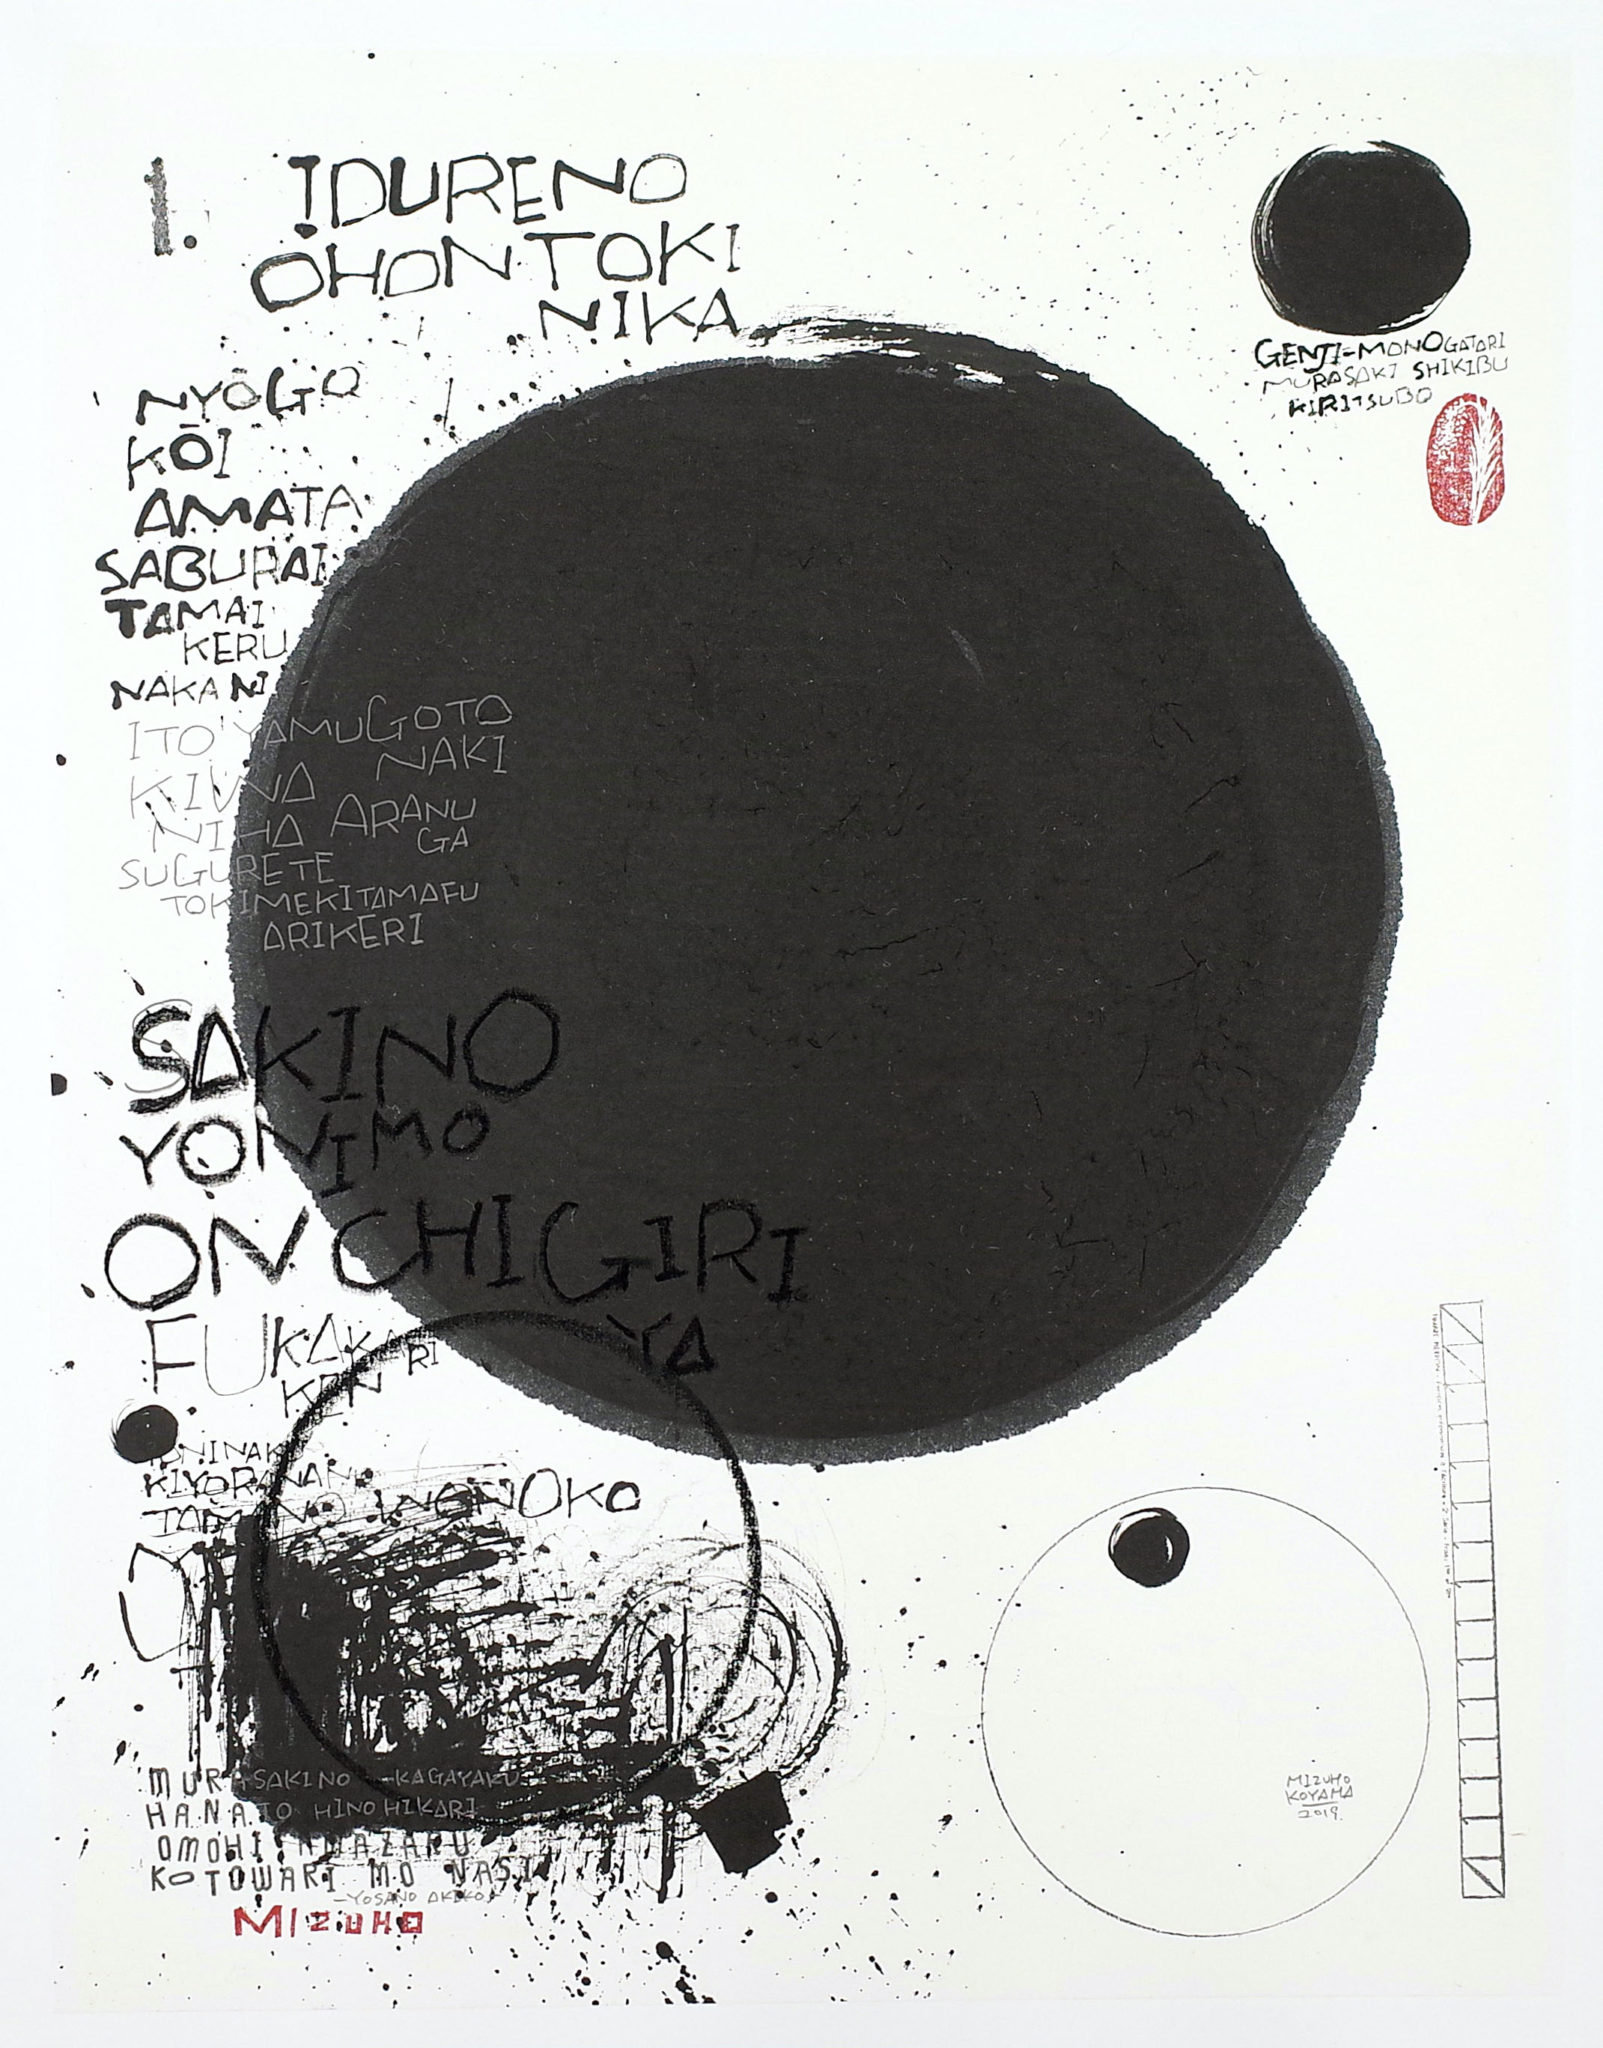 Mizuho Koyama, 1 KIRITSUBO, 2019_Nouvelle calligraphie, 48,6 x 37 cm © Mizuho Koyama